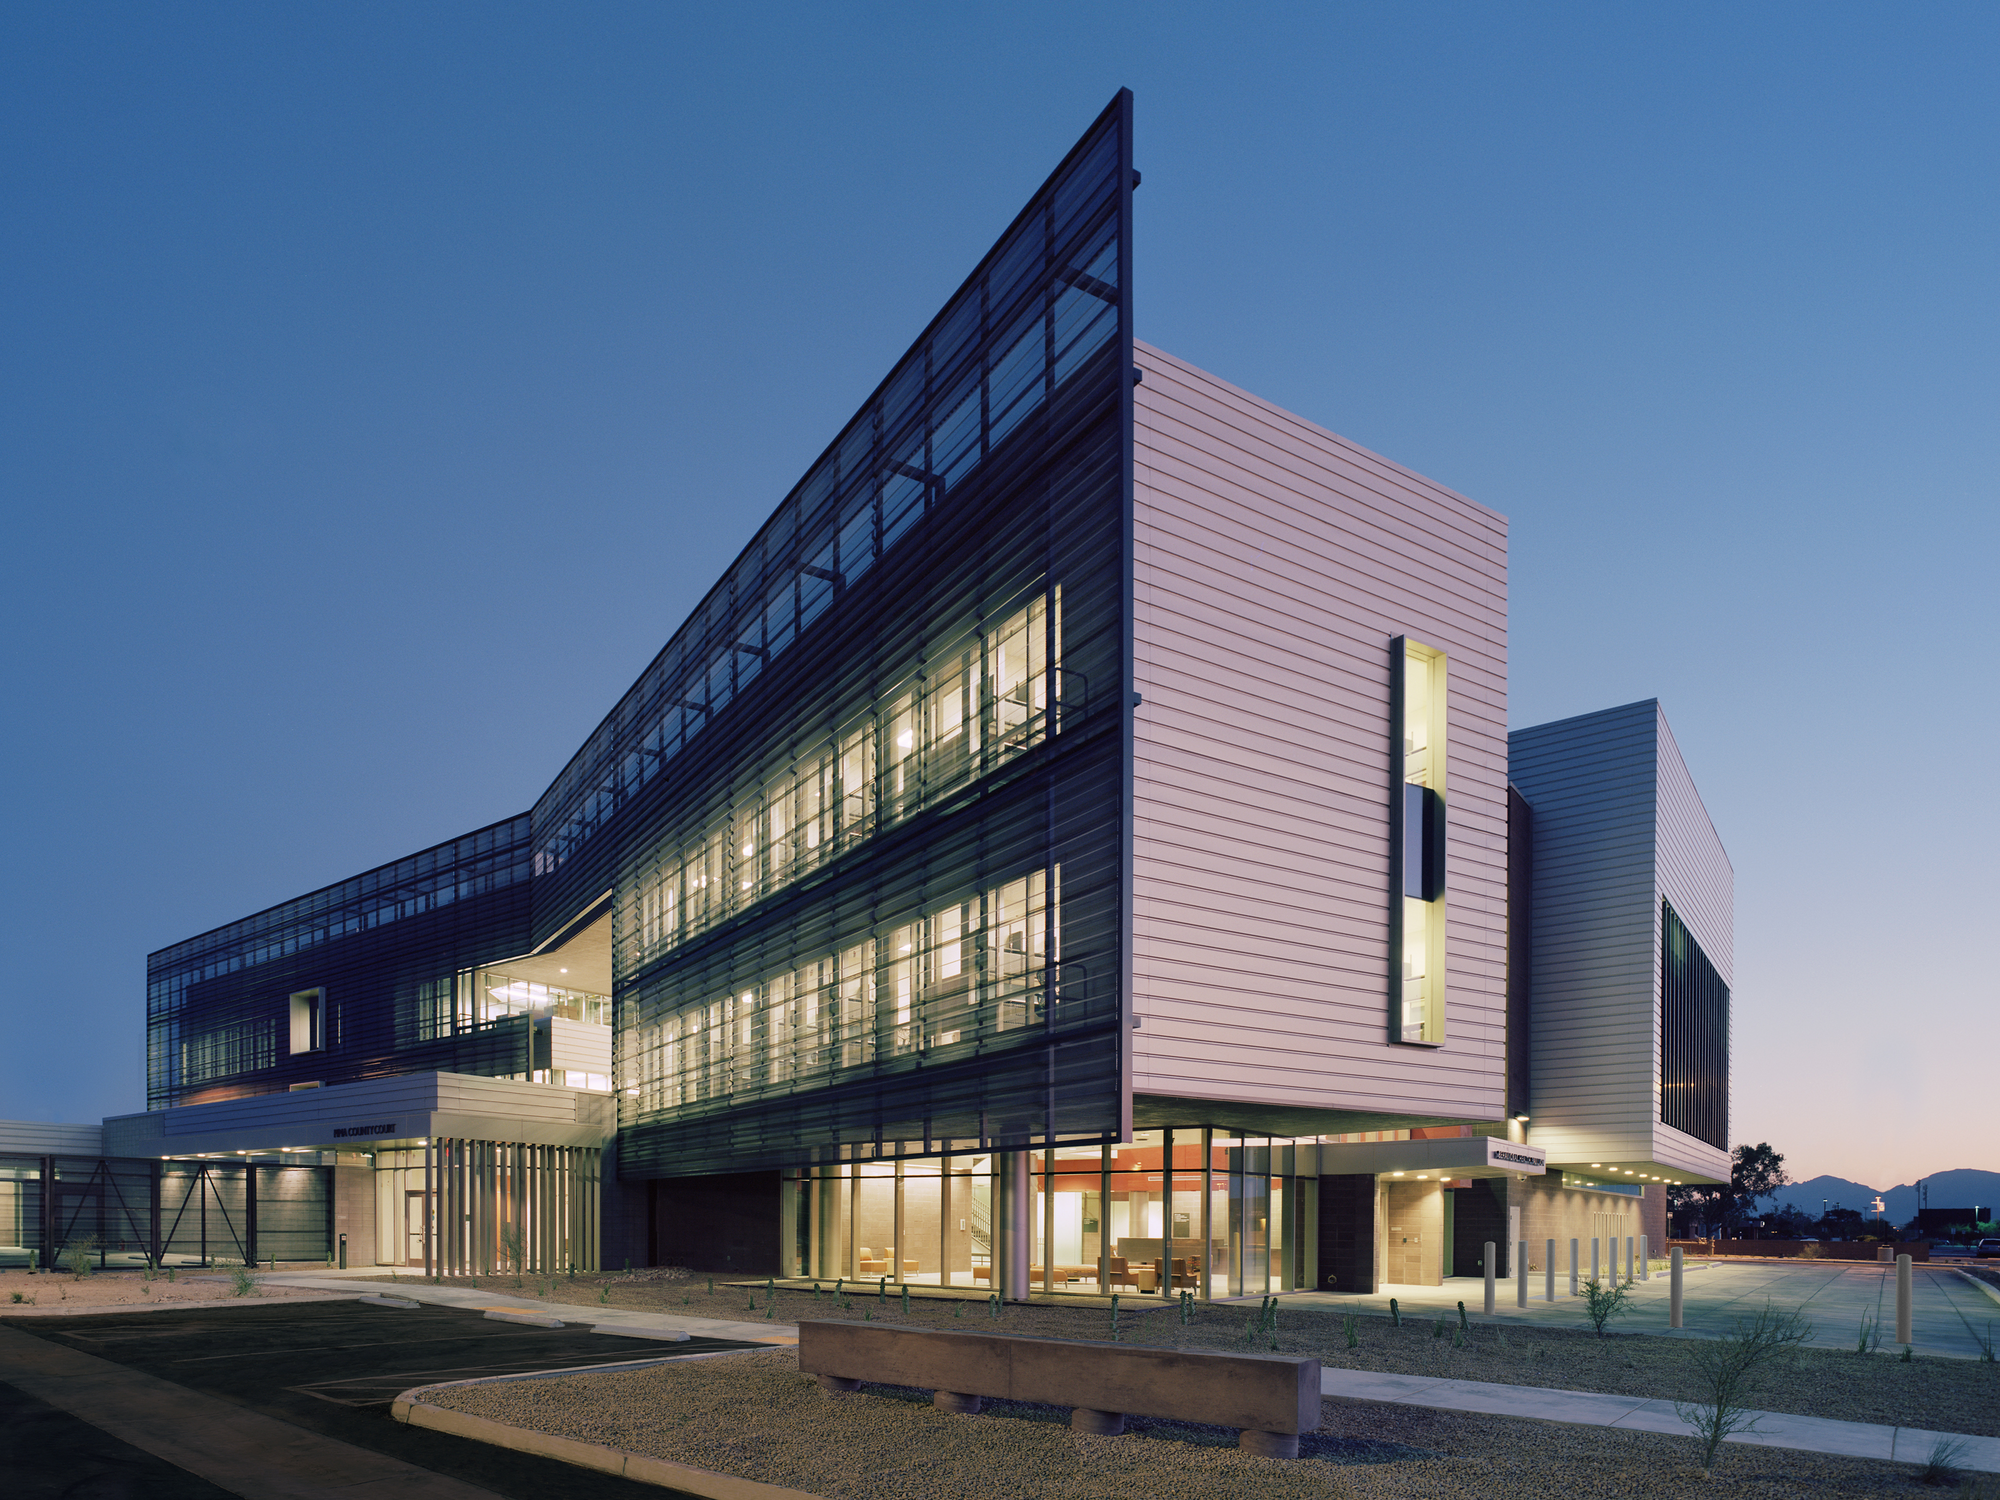 University Of Arizona Medical Center South Campus Cannon